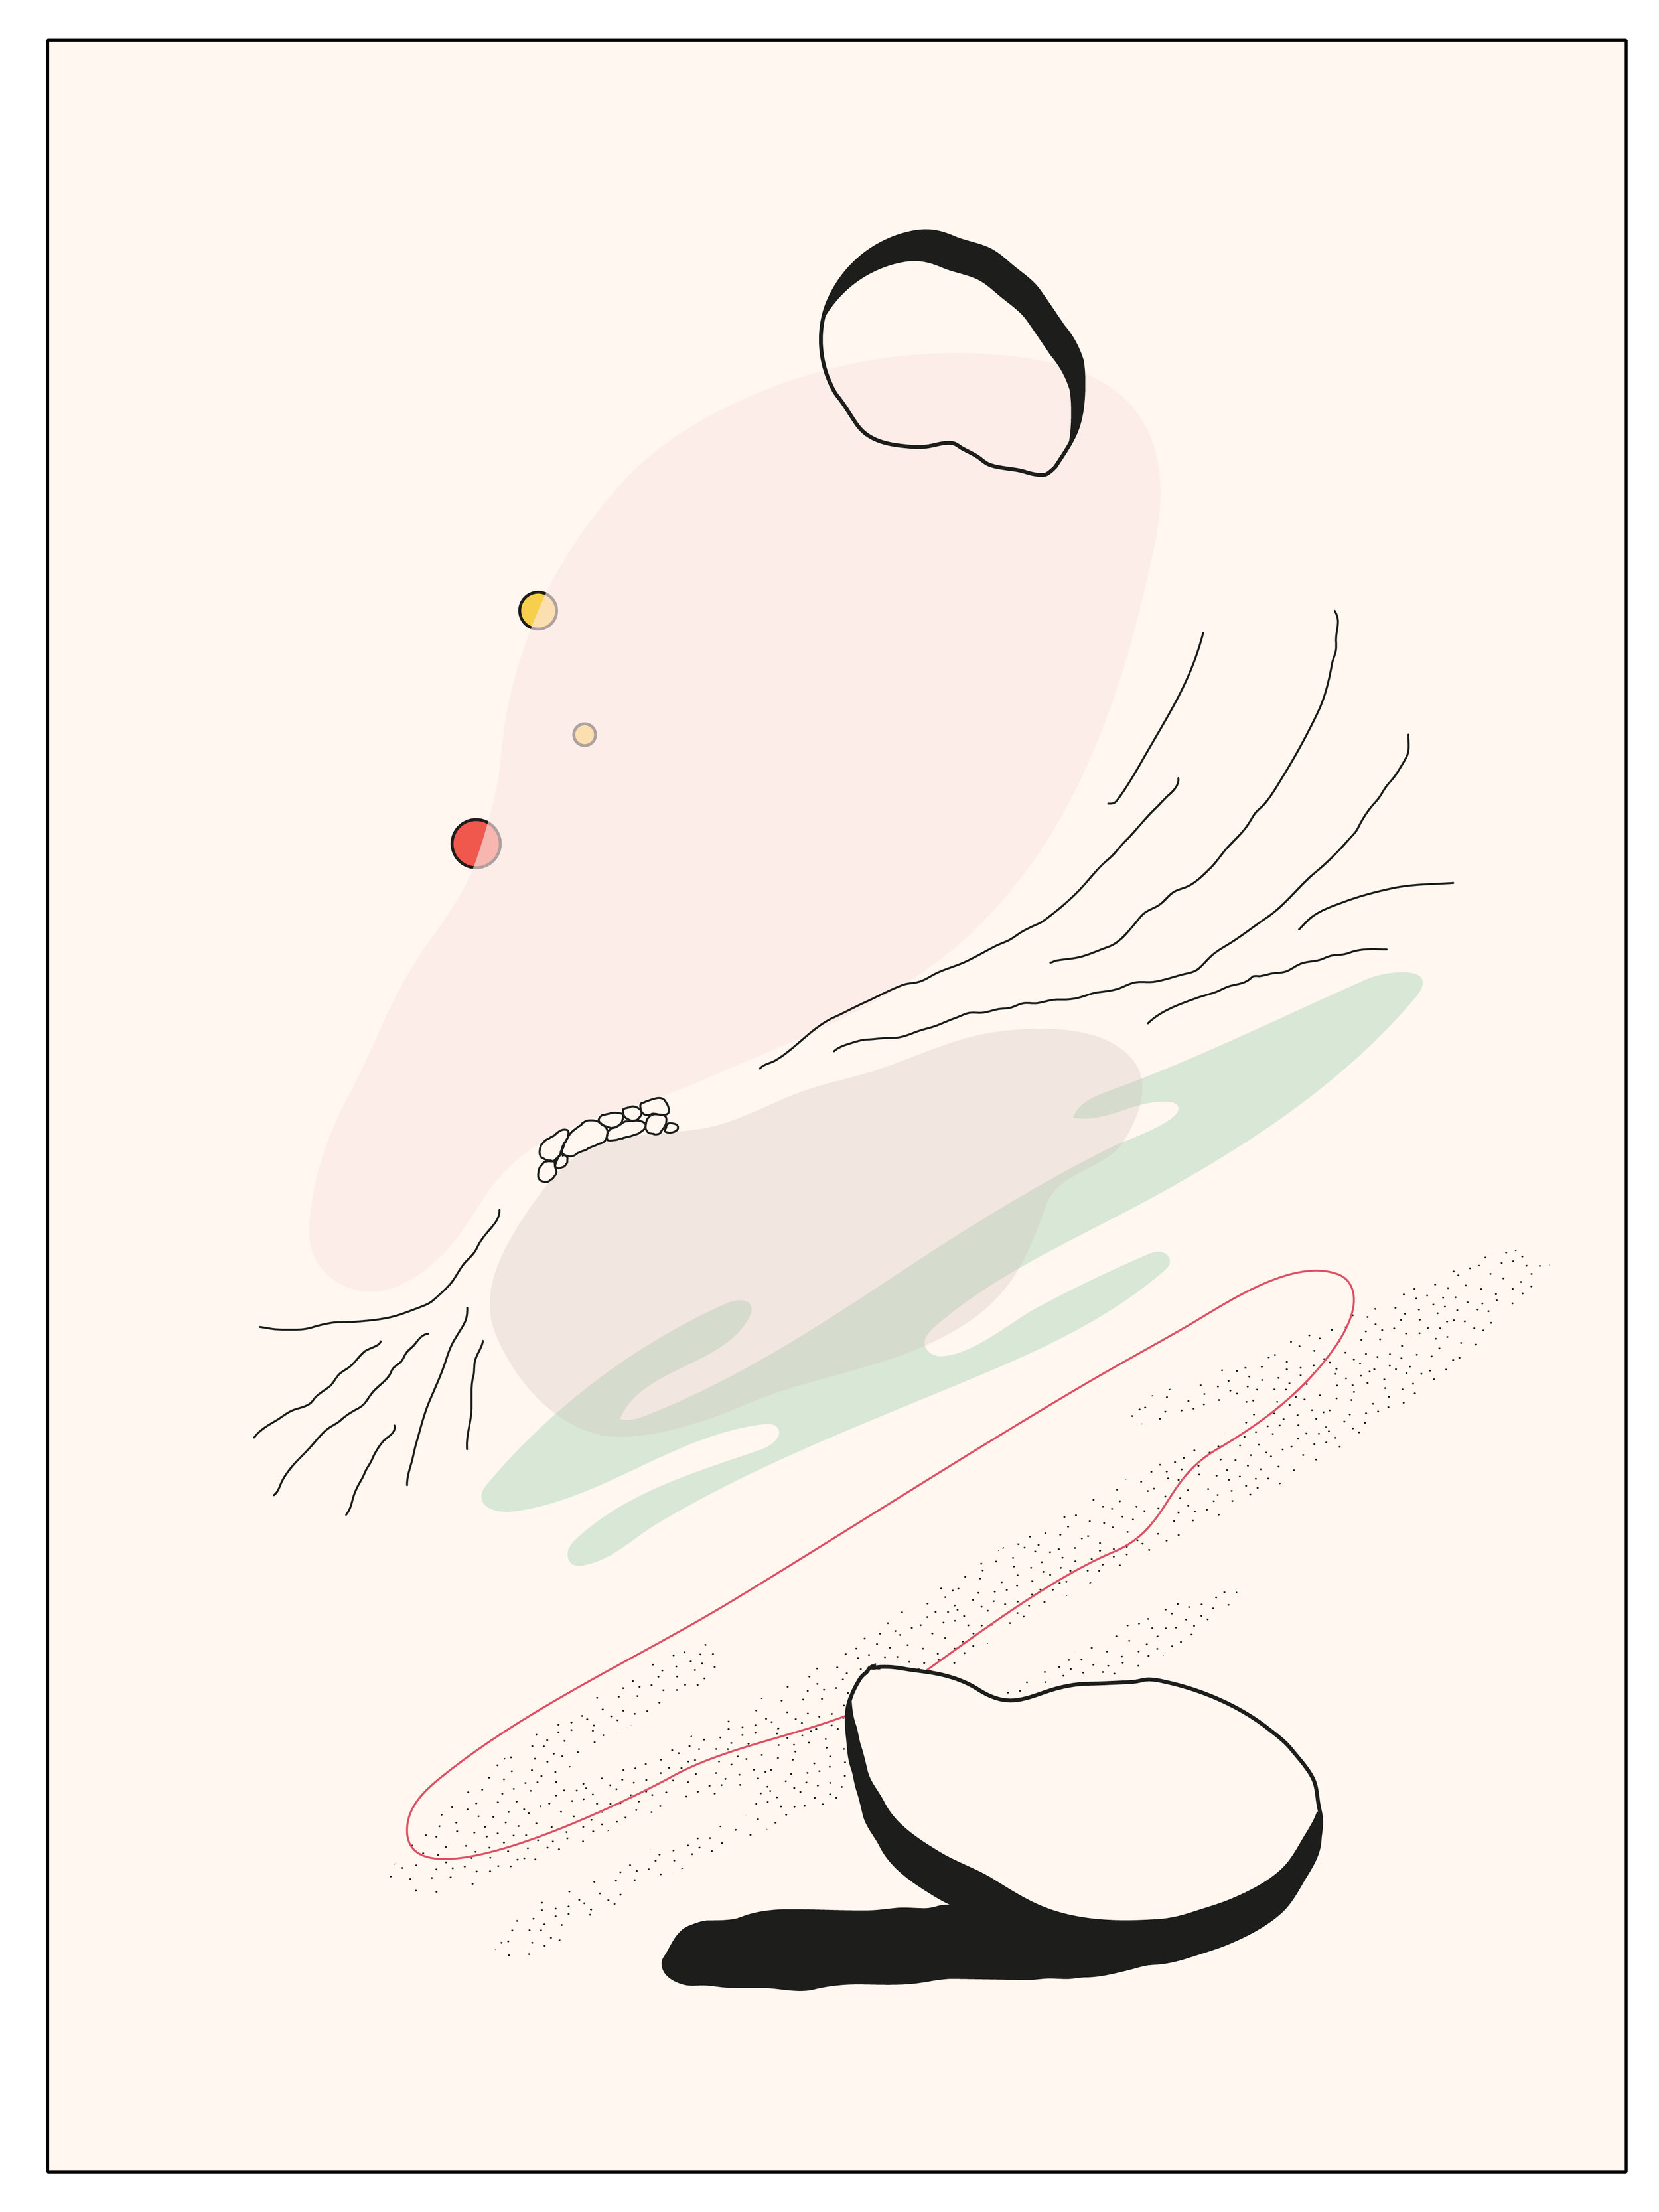 postcards from jenna 2-01.jpg